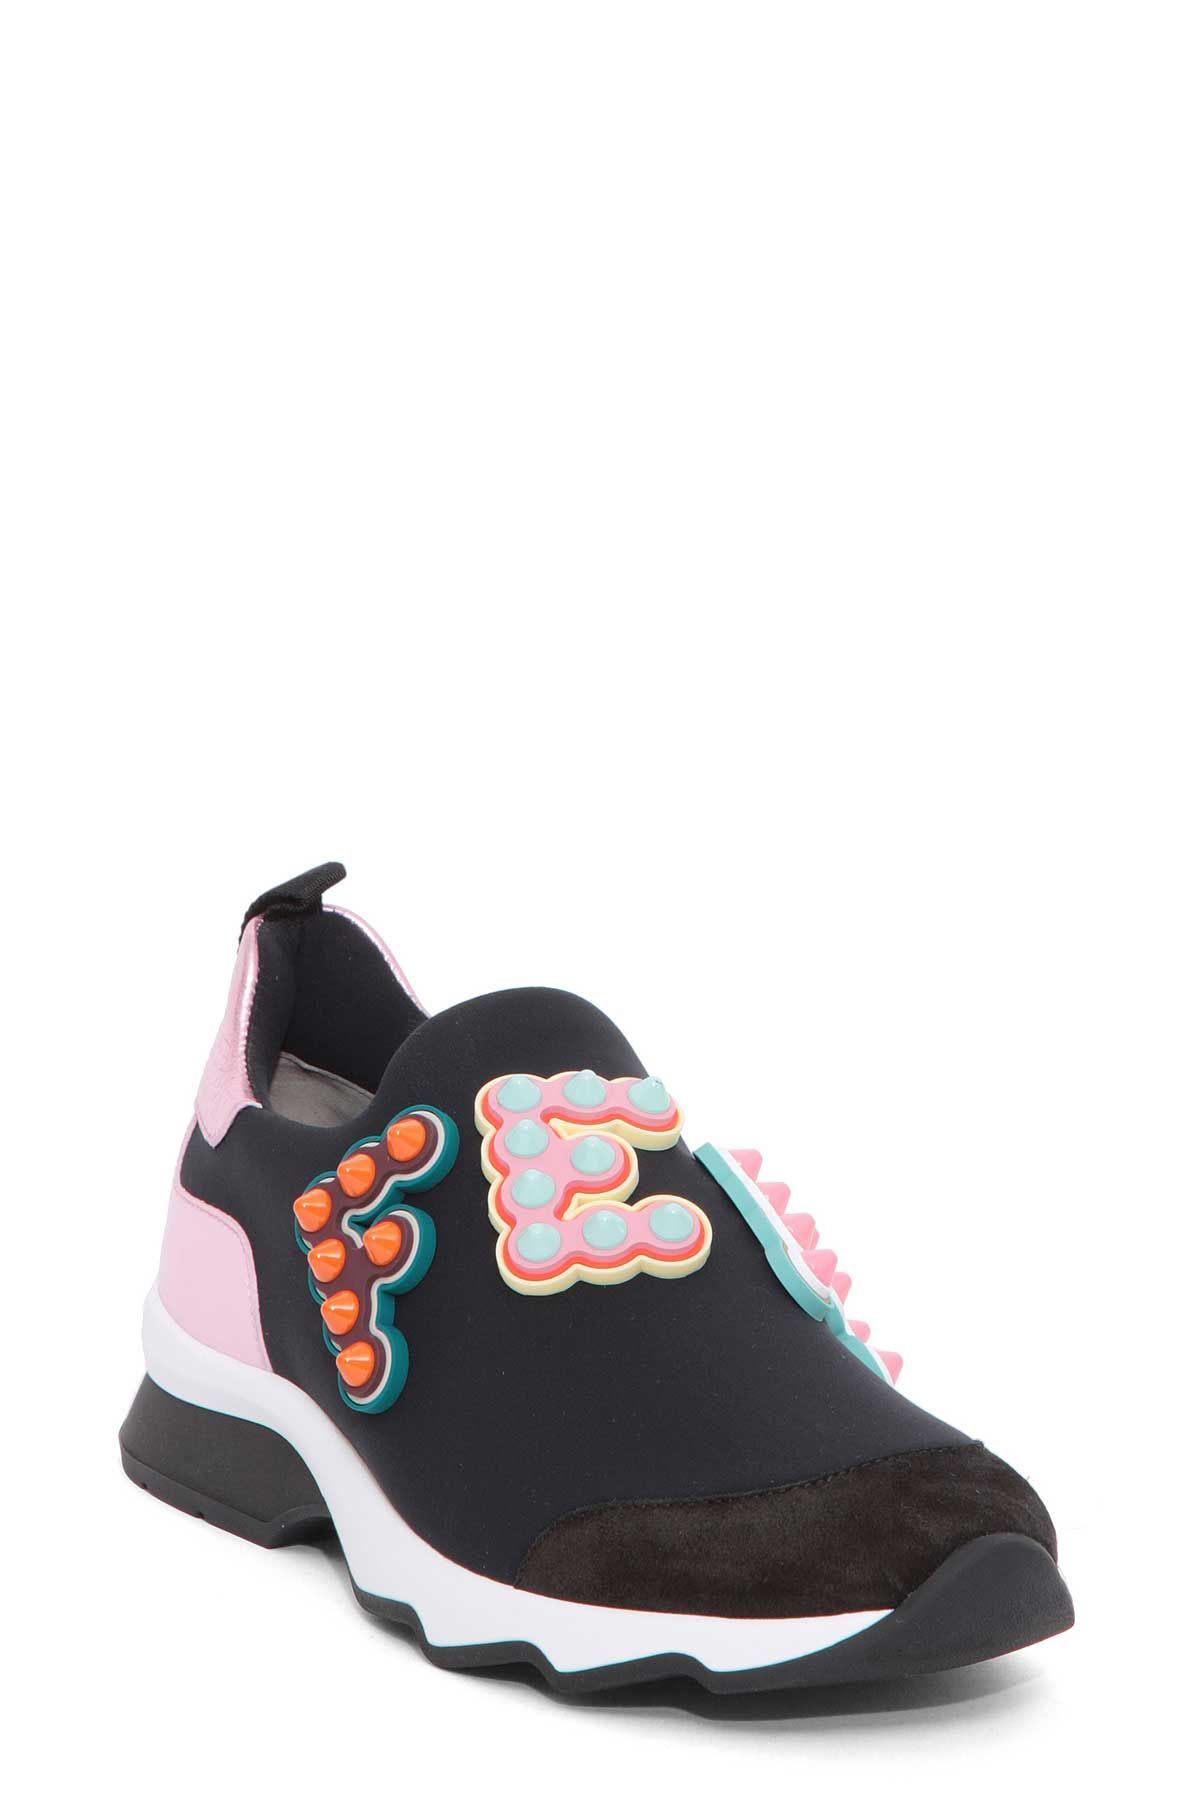 Fendi Fendi Multicolor Sneaker Fendi